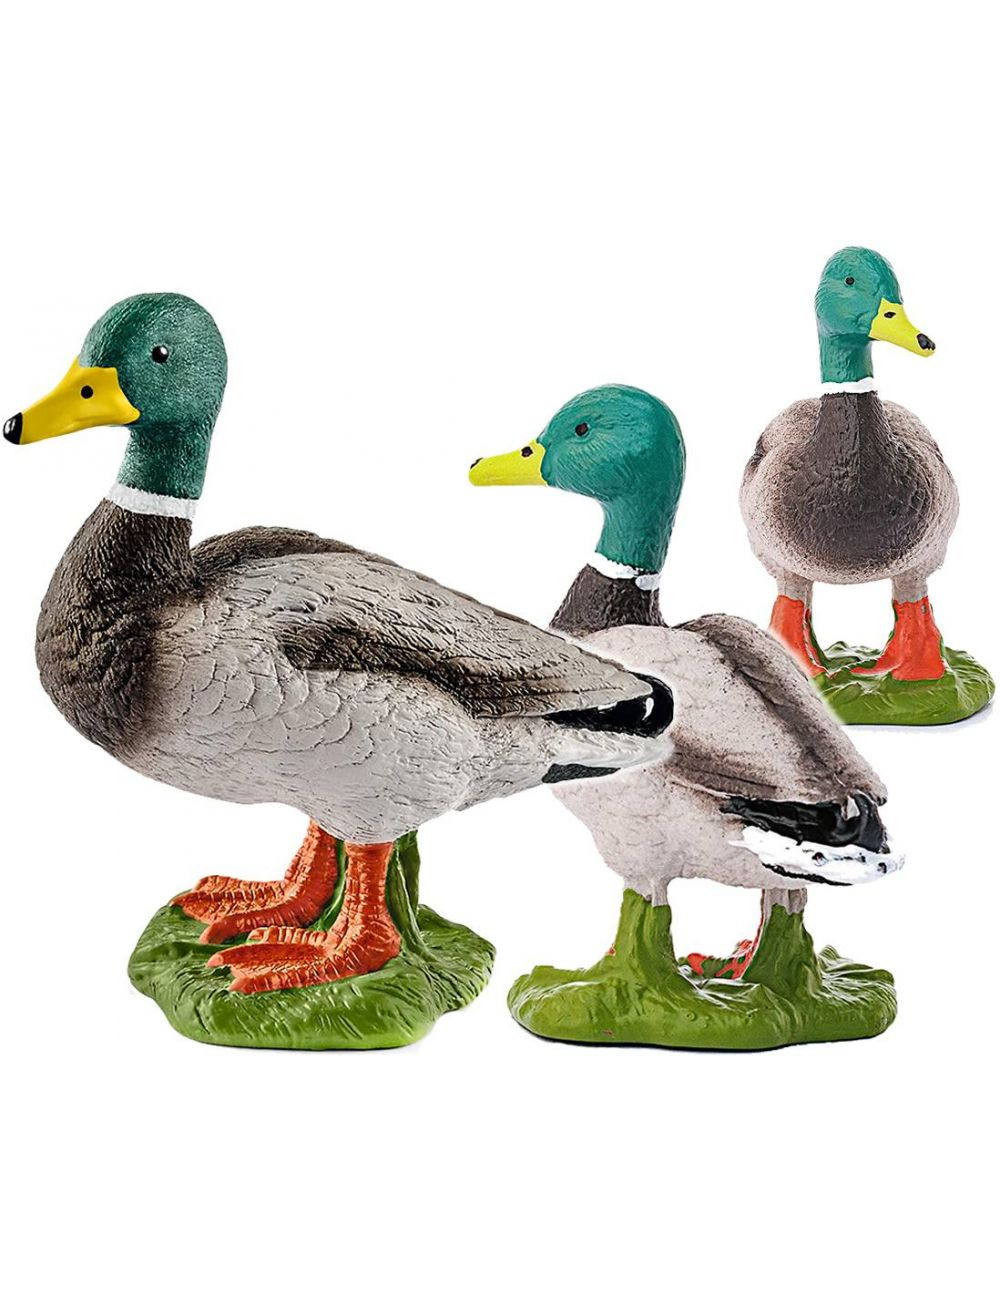 Schleich 13824 Figurka Kaczki Farm World